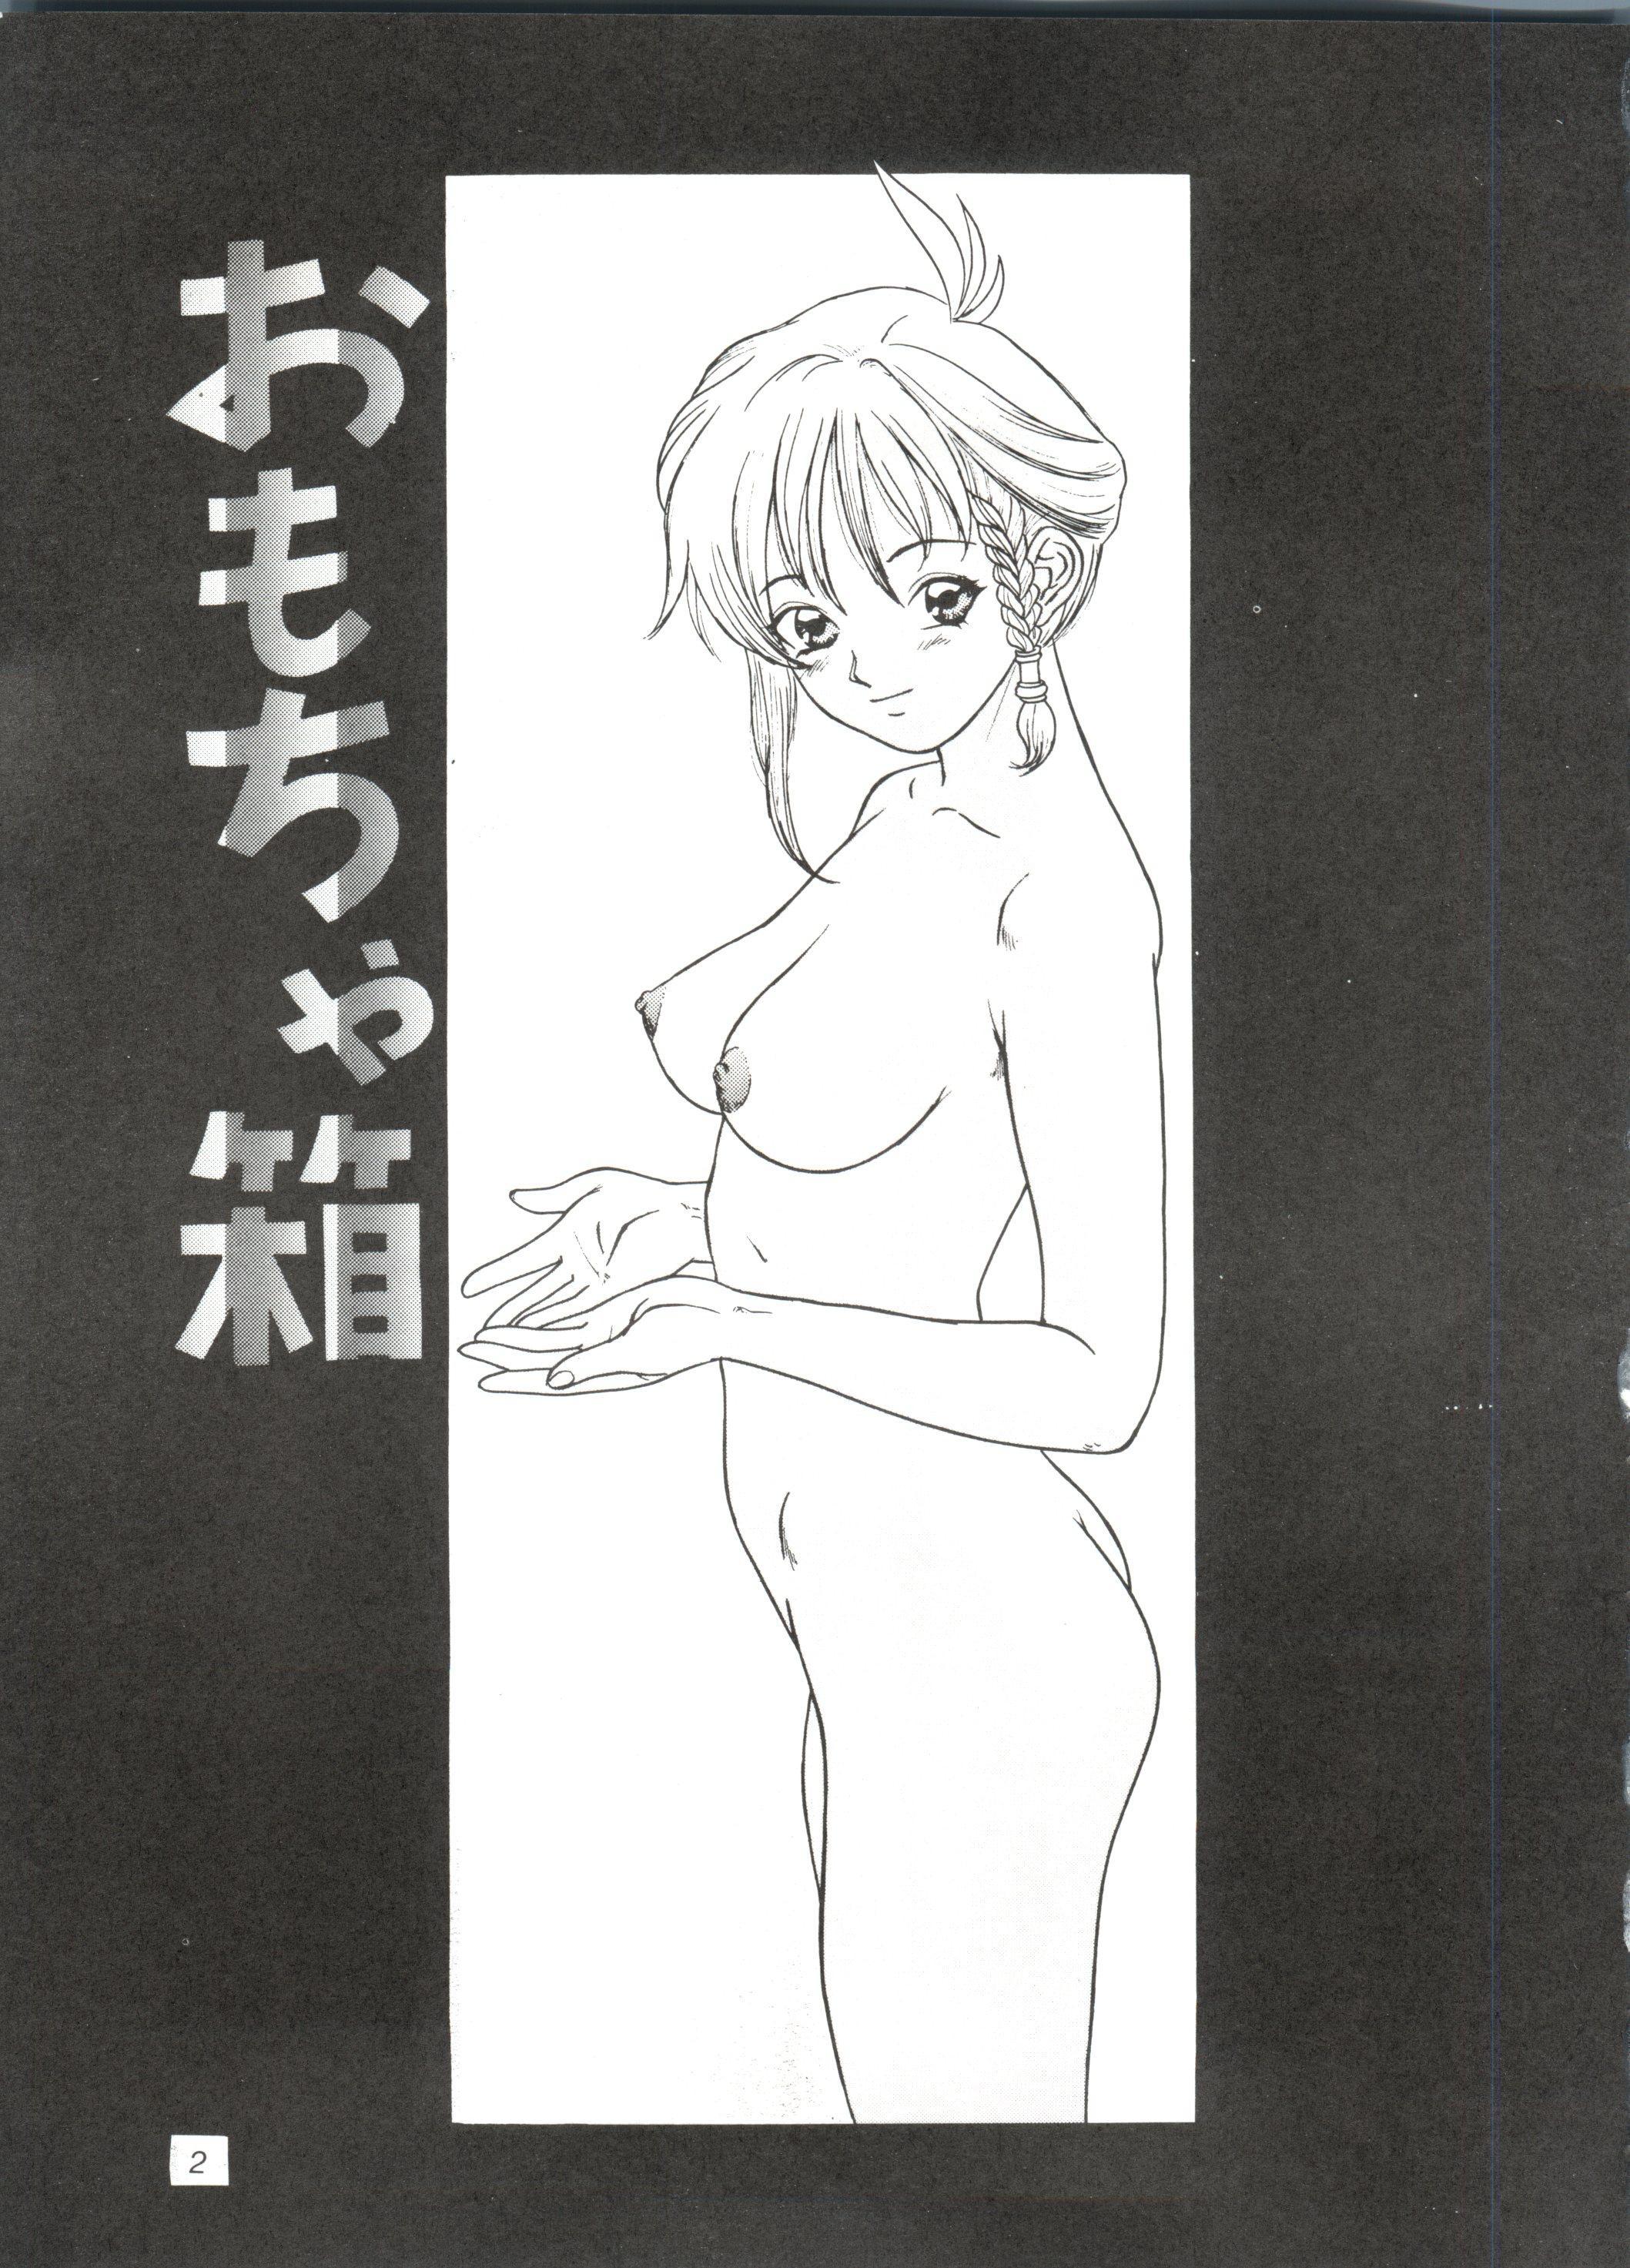 Omocha Hako 3